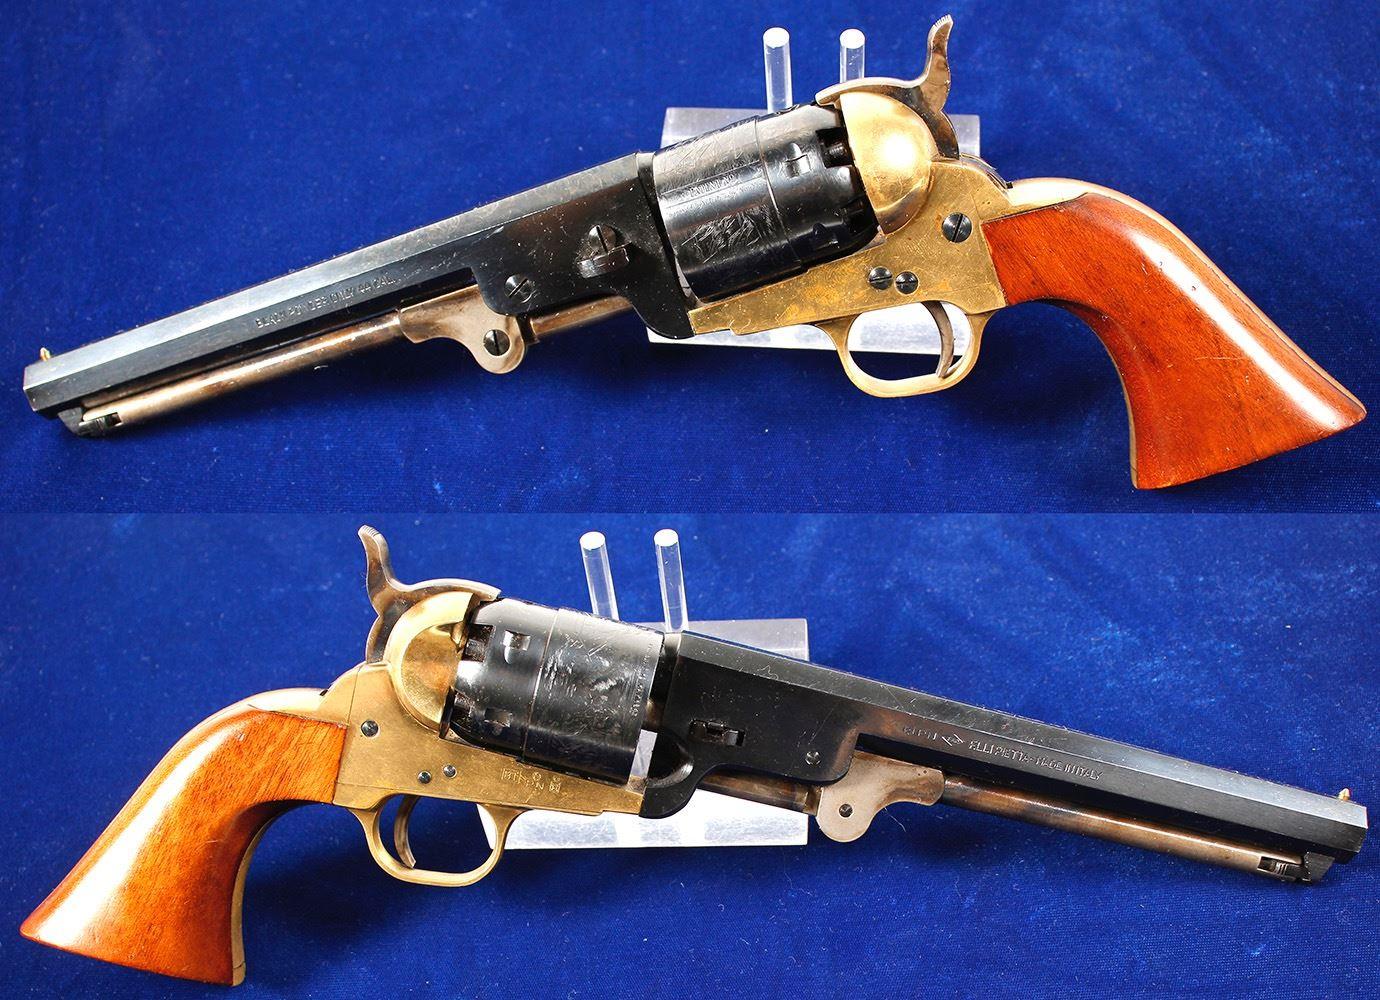 Replica 1851 Confederate Navy pistol  44 cal